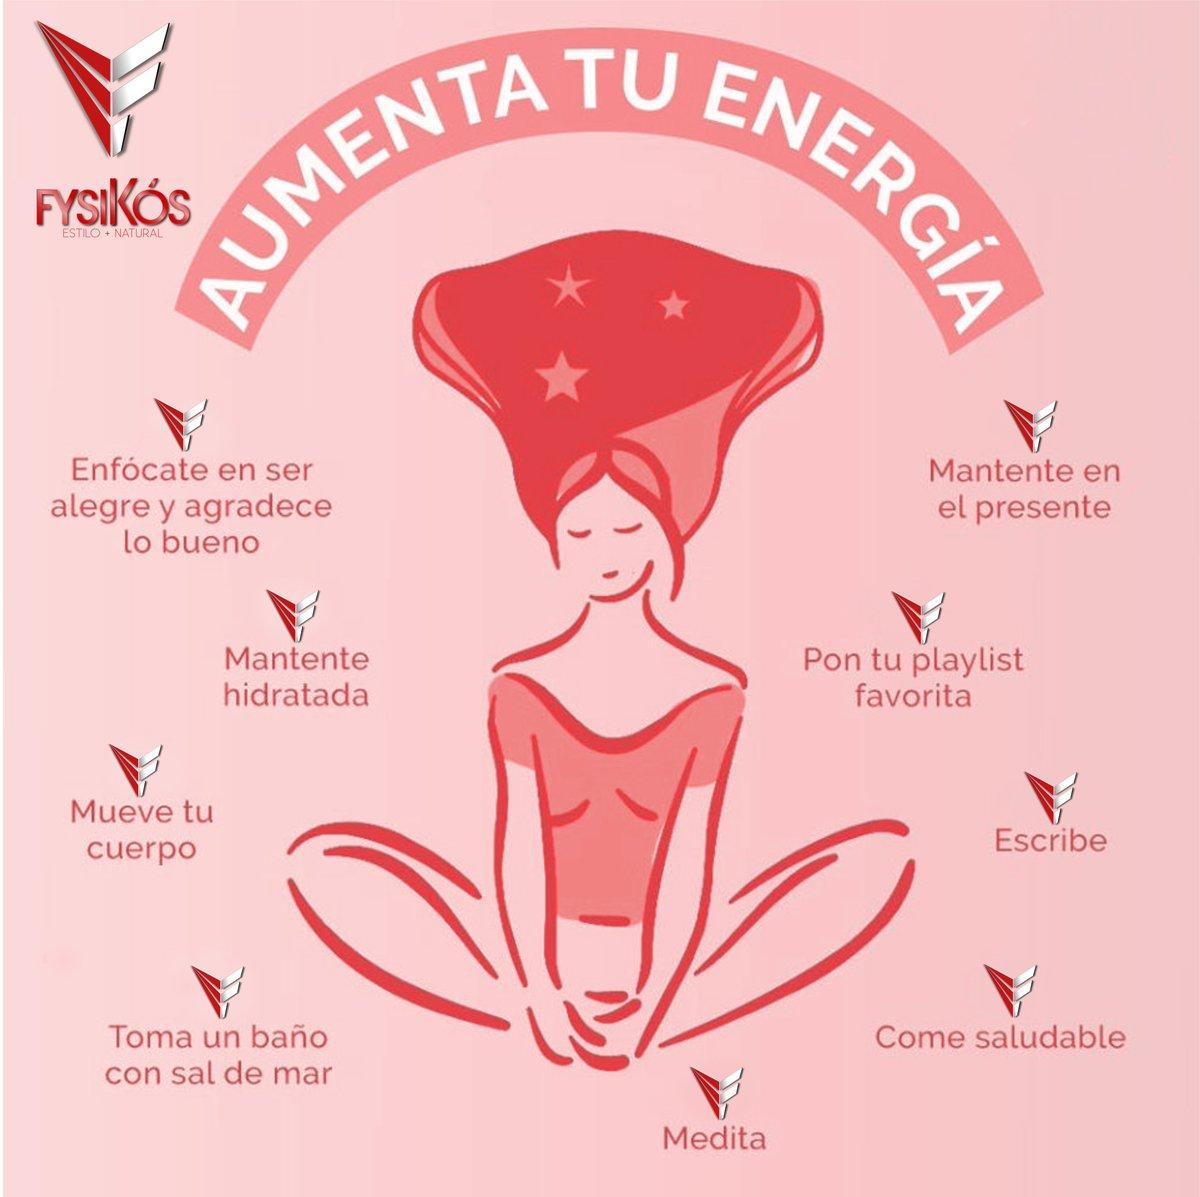 SABÍAS QUÉ… Para aumentar tu energía cada, debes seguir estos pasos:  #Fysikos #Arana #QuedateEnCasa #BeStrong #fitnessaddiction #Bodybuilding #Fitness #Coach #Throwbackthursday #Motivation # Fitness #Health #Salud https://t.co/cZ2D91VNeW